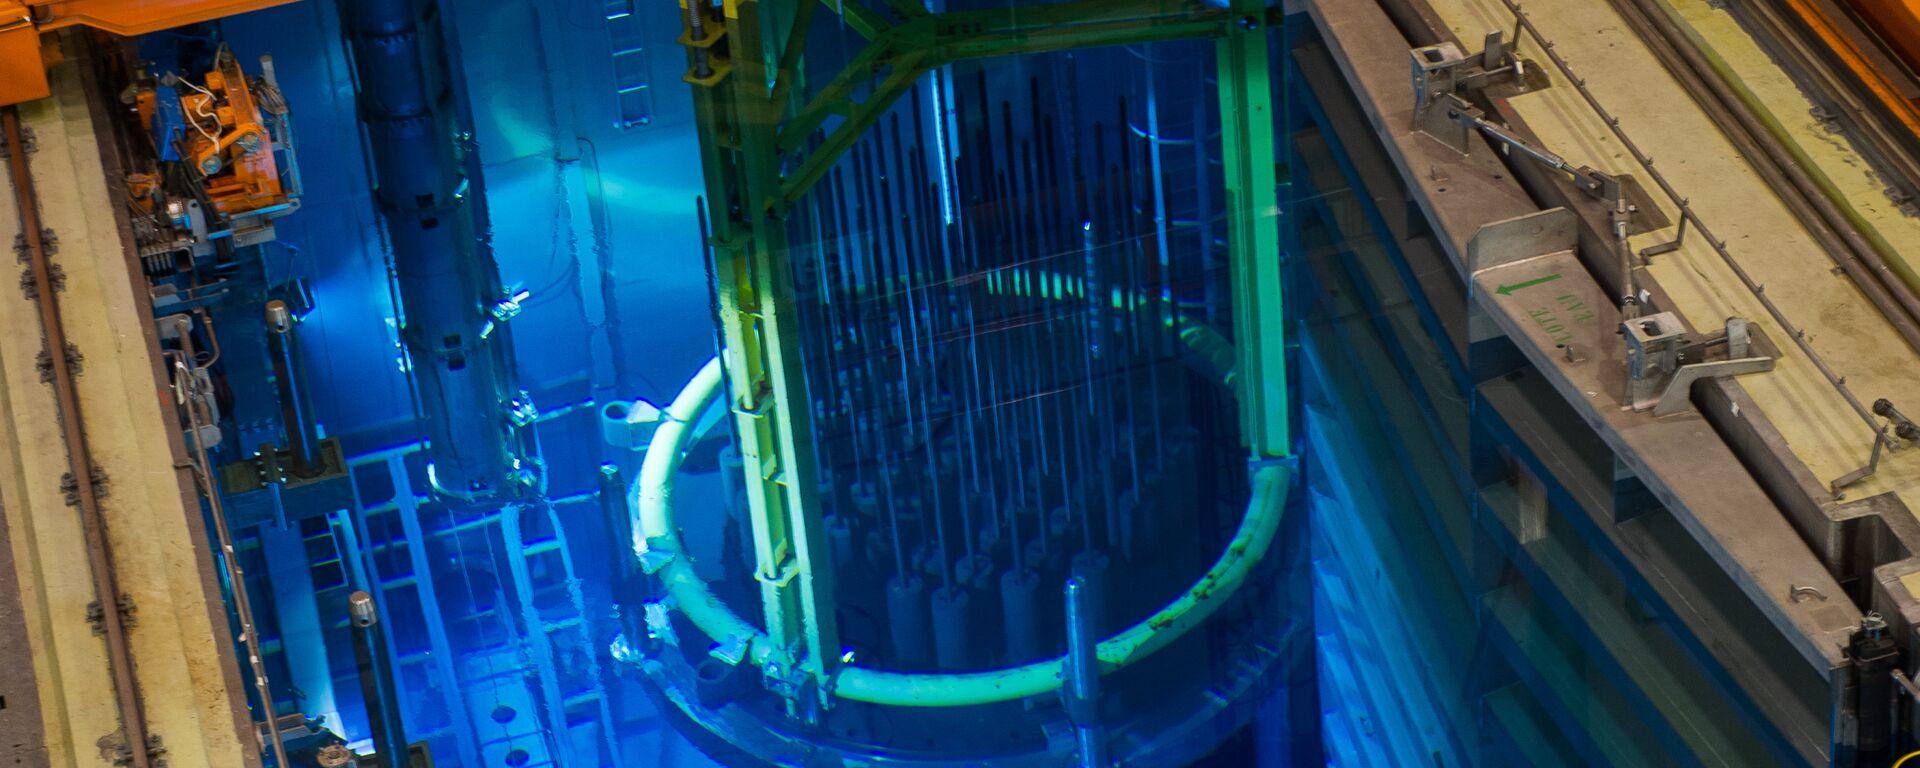 Jaderný reaktor - Sputnik Česká republika, 1920, 09.08.2016